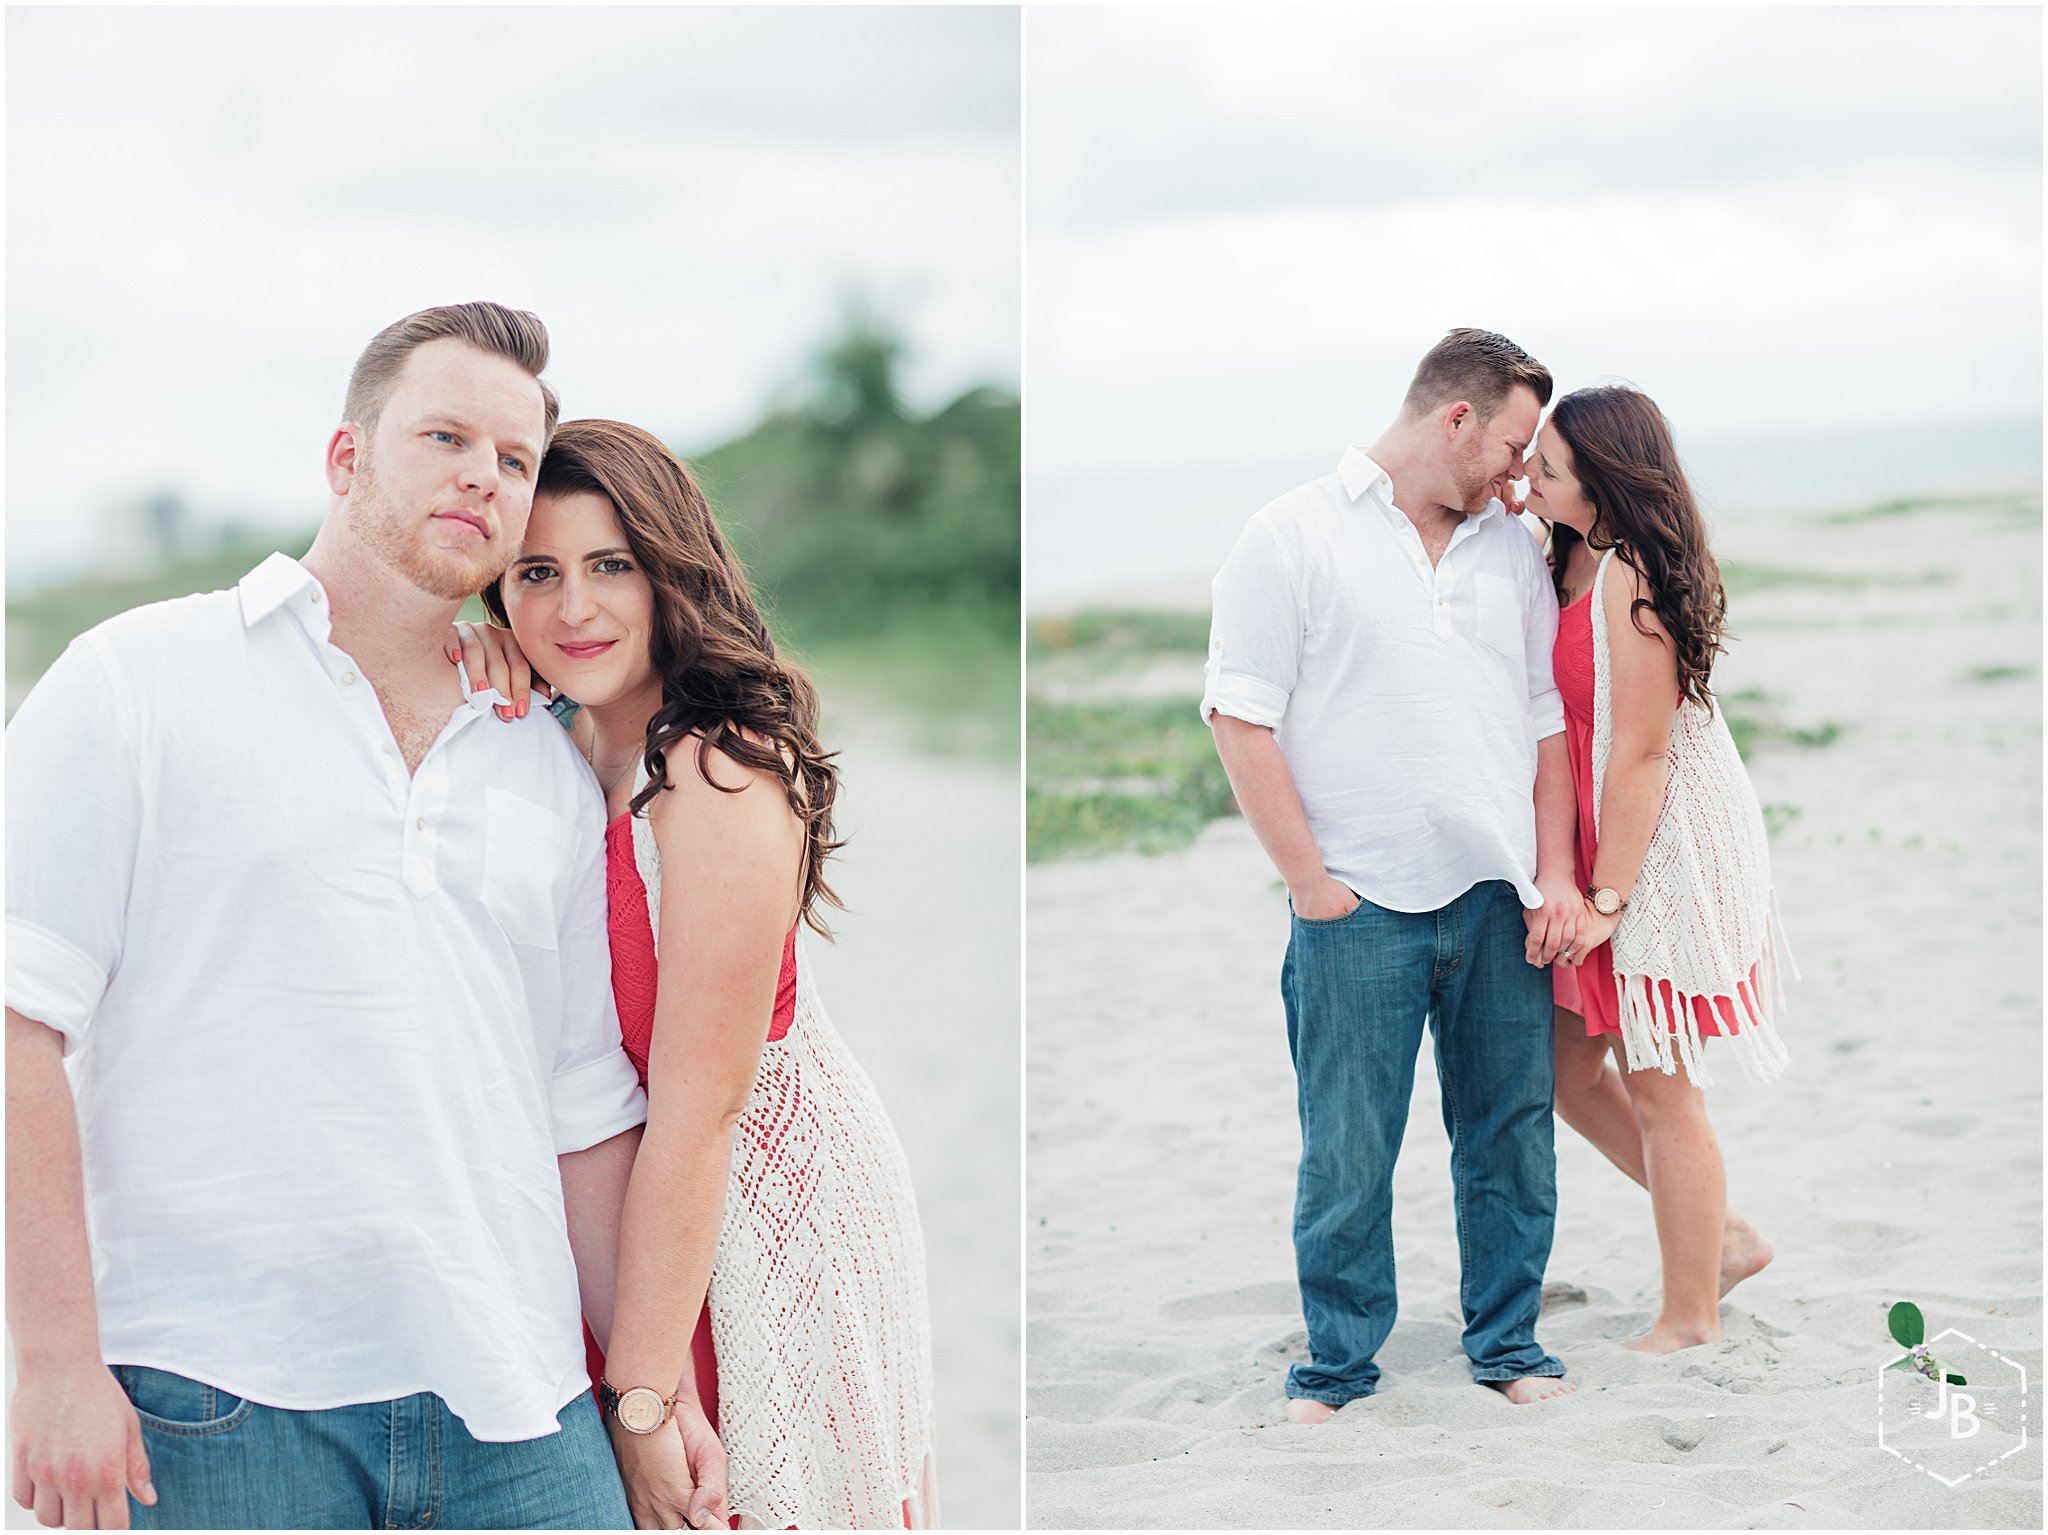 WeddingandEngagementFloridaPhotographer_0018.jpg